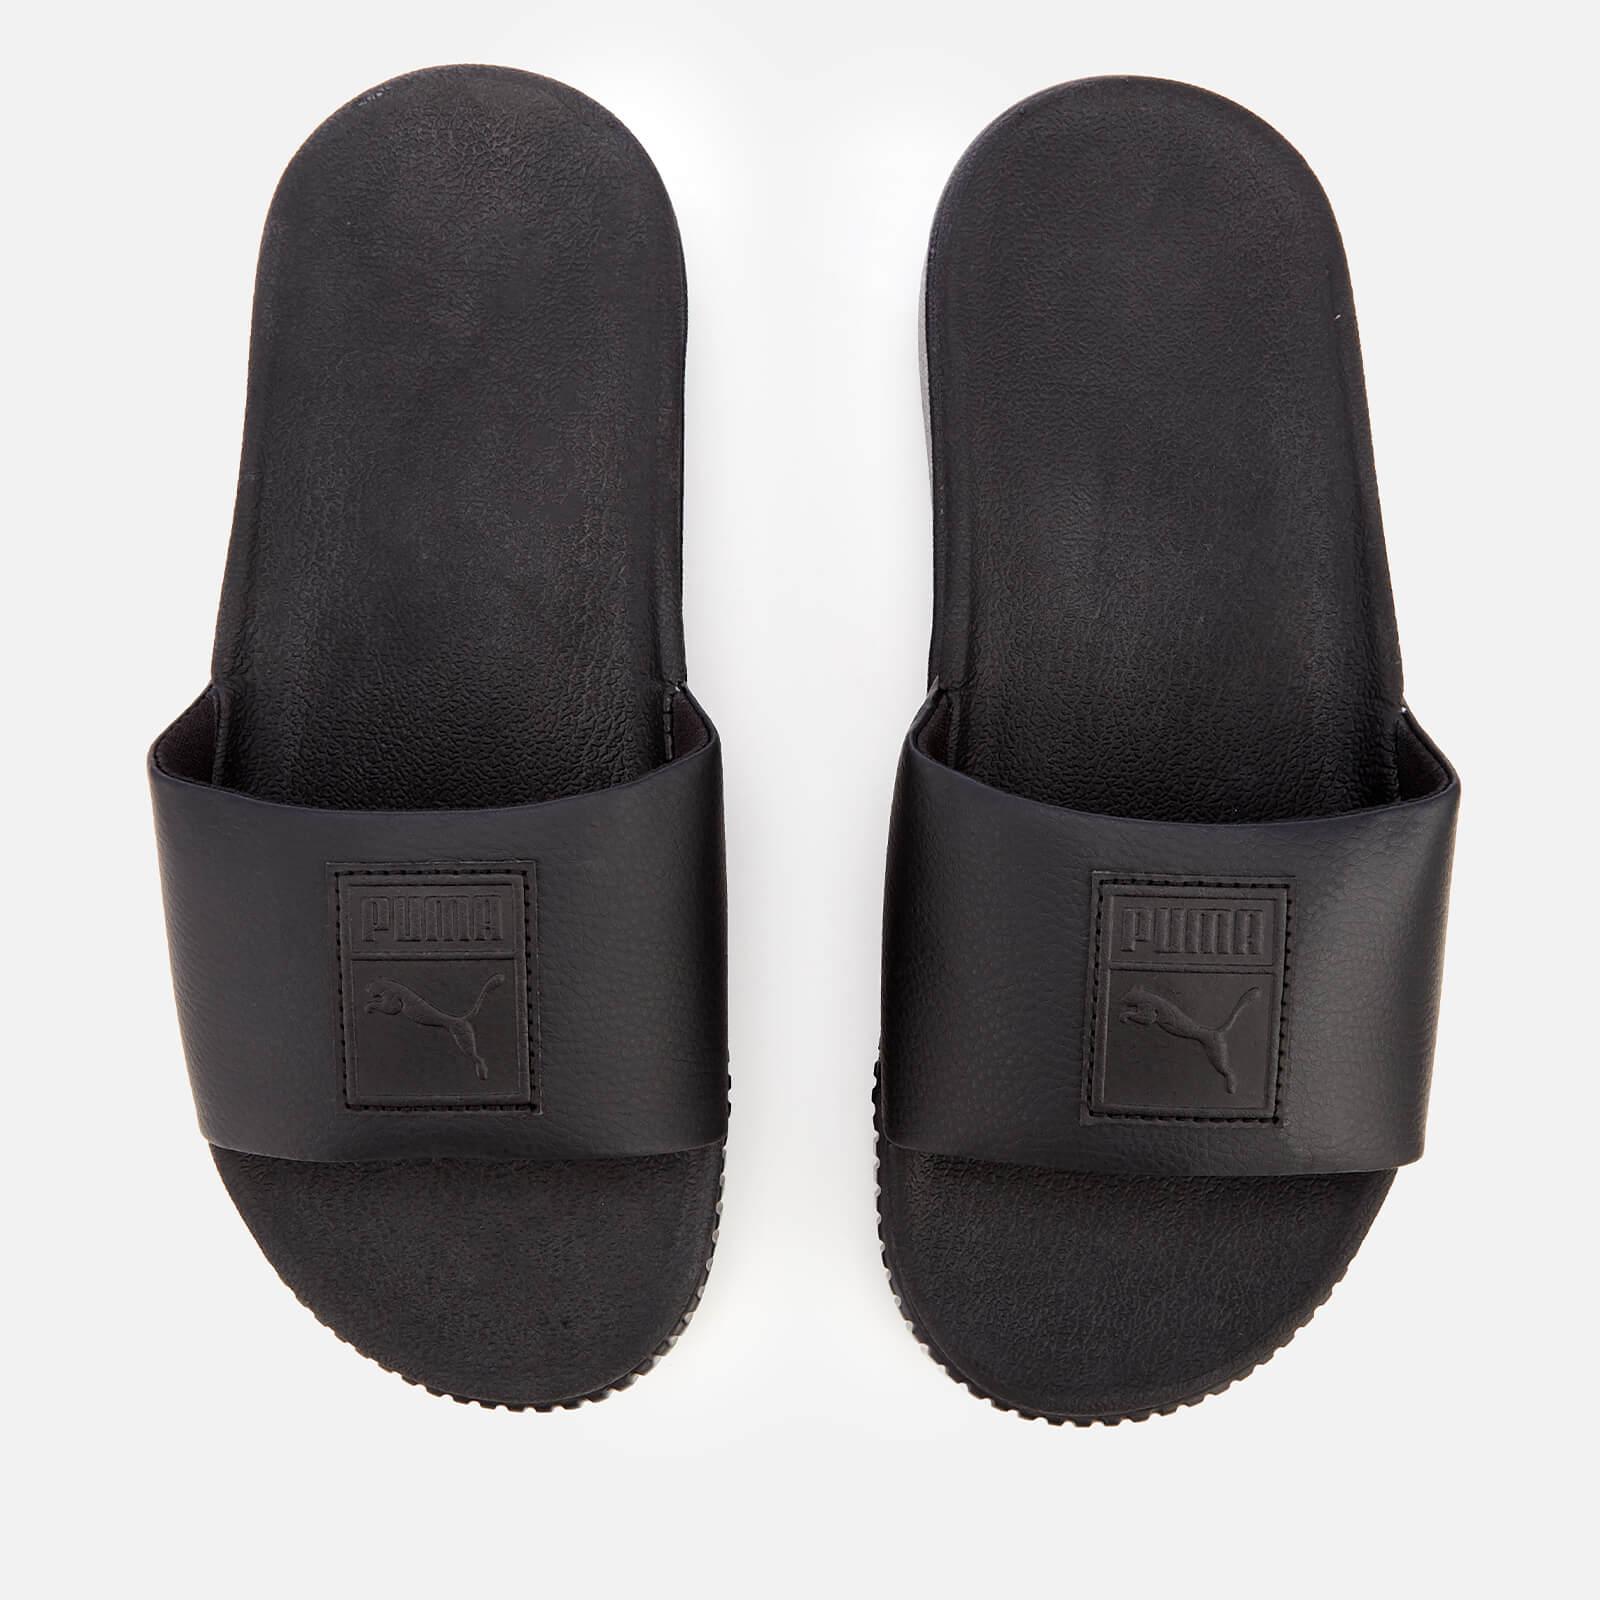 Puma Women's Platform Slide Sandals - Puma Black/Puma Black - UK 4 - Black